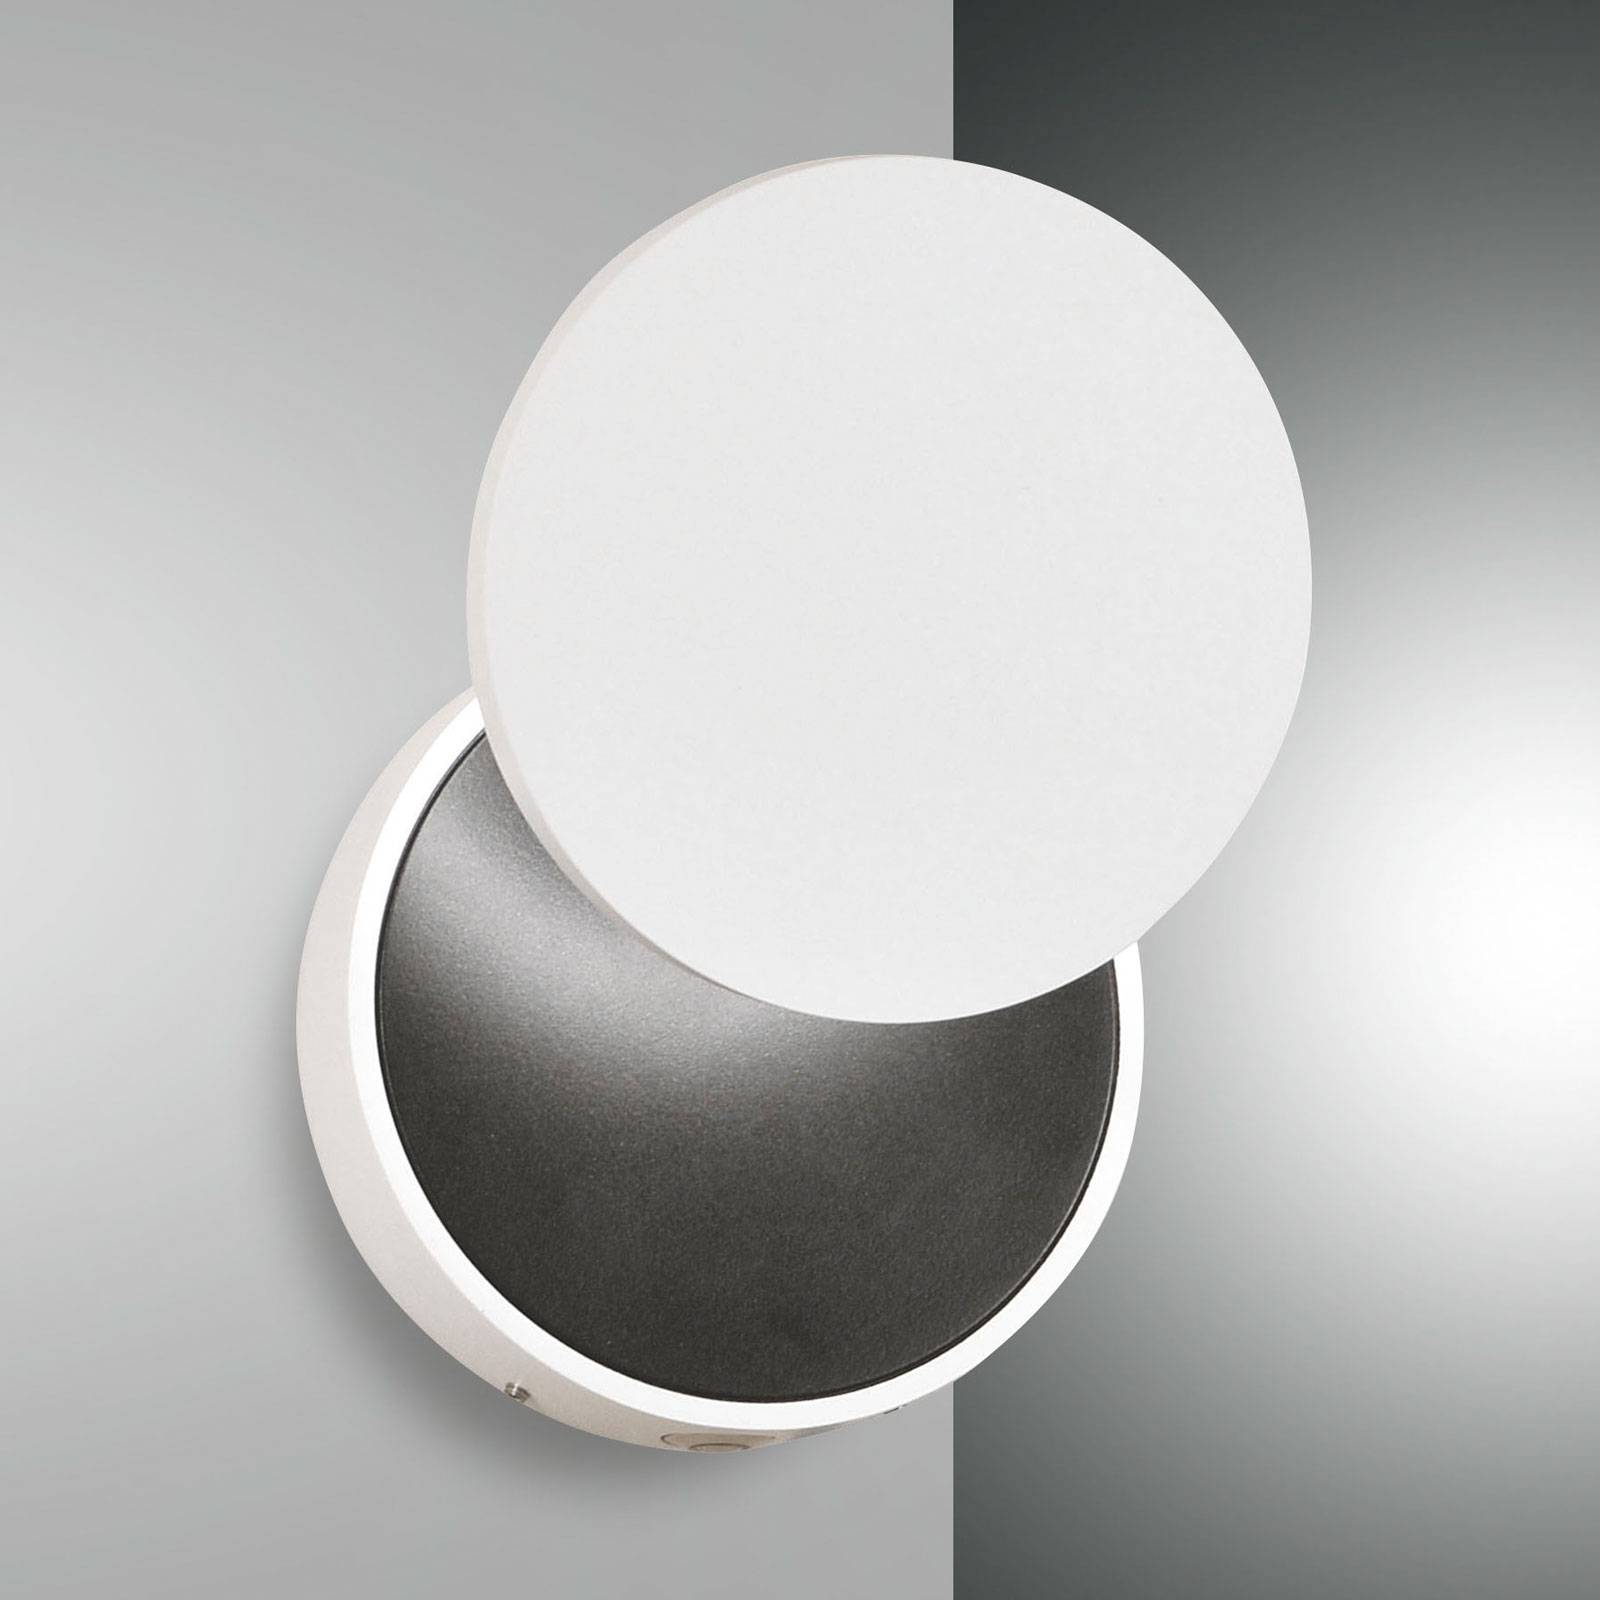 LED wandlamp Ara met leesspot, wit-zwart